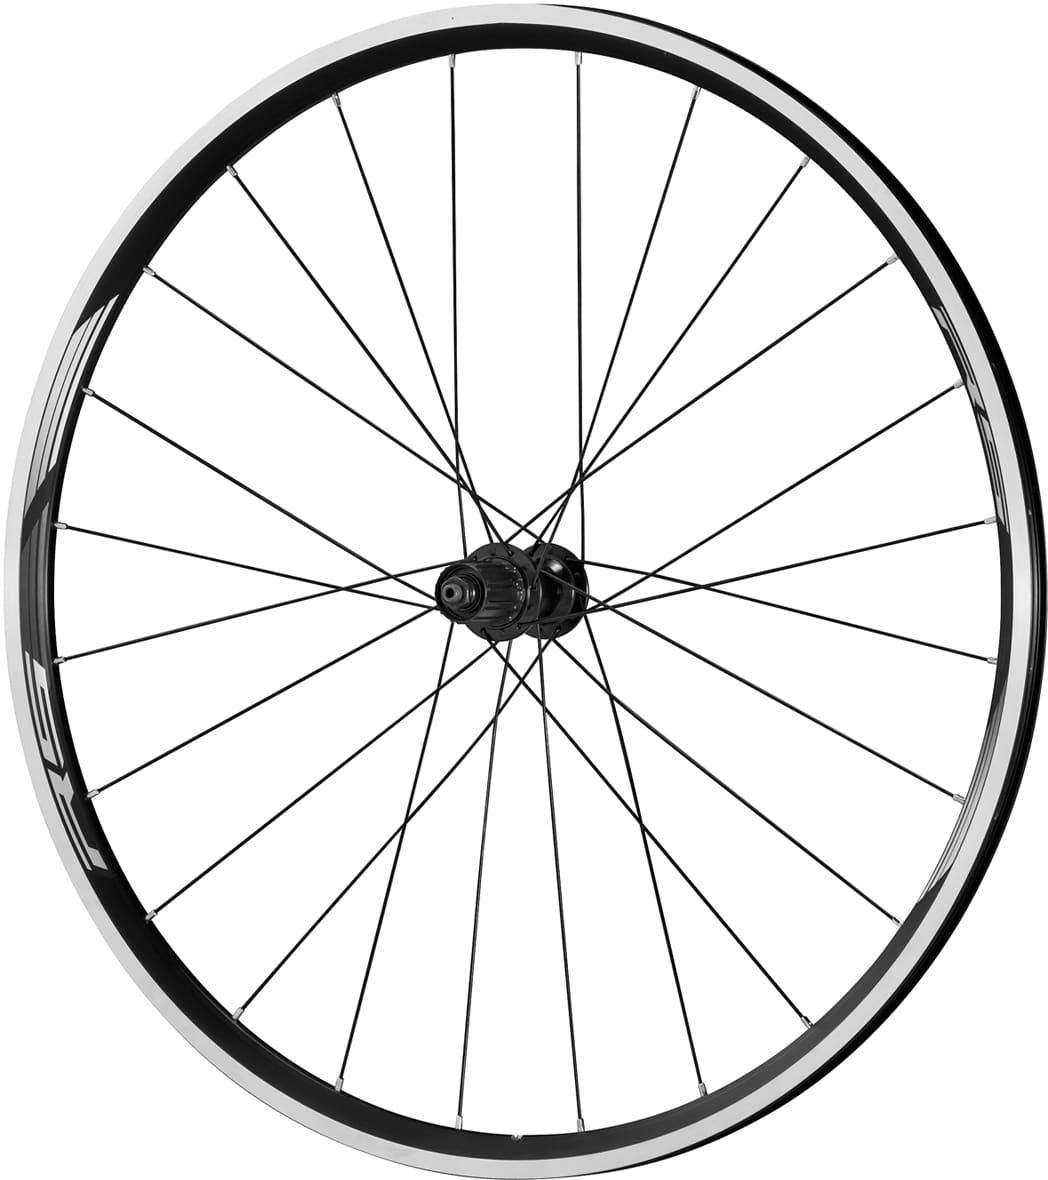 shimano rs010 clincher rear wheel